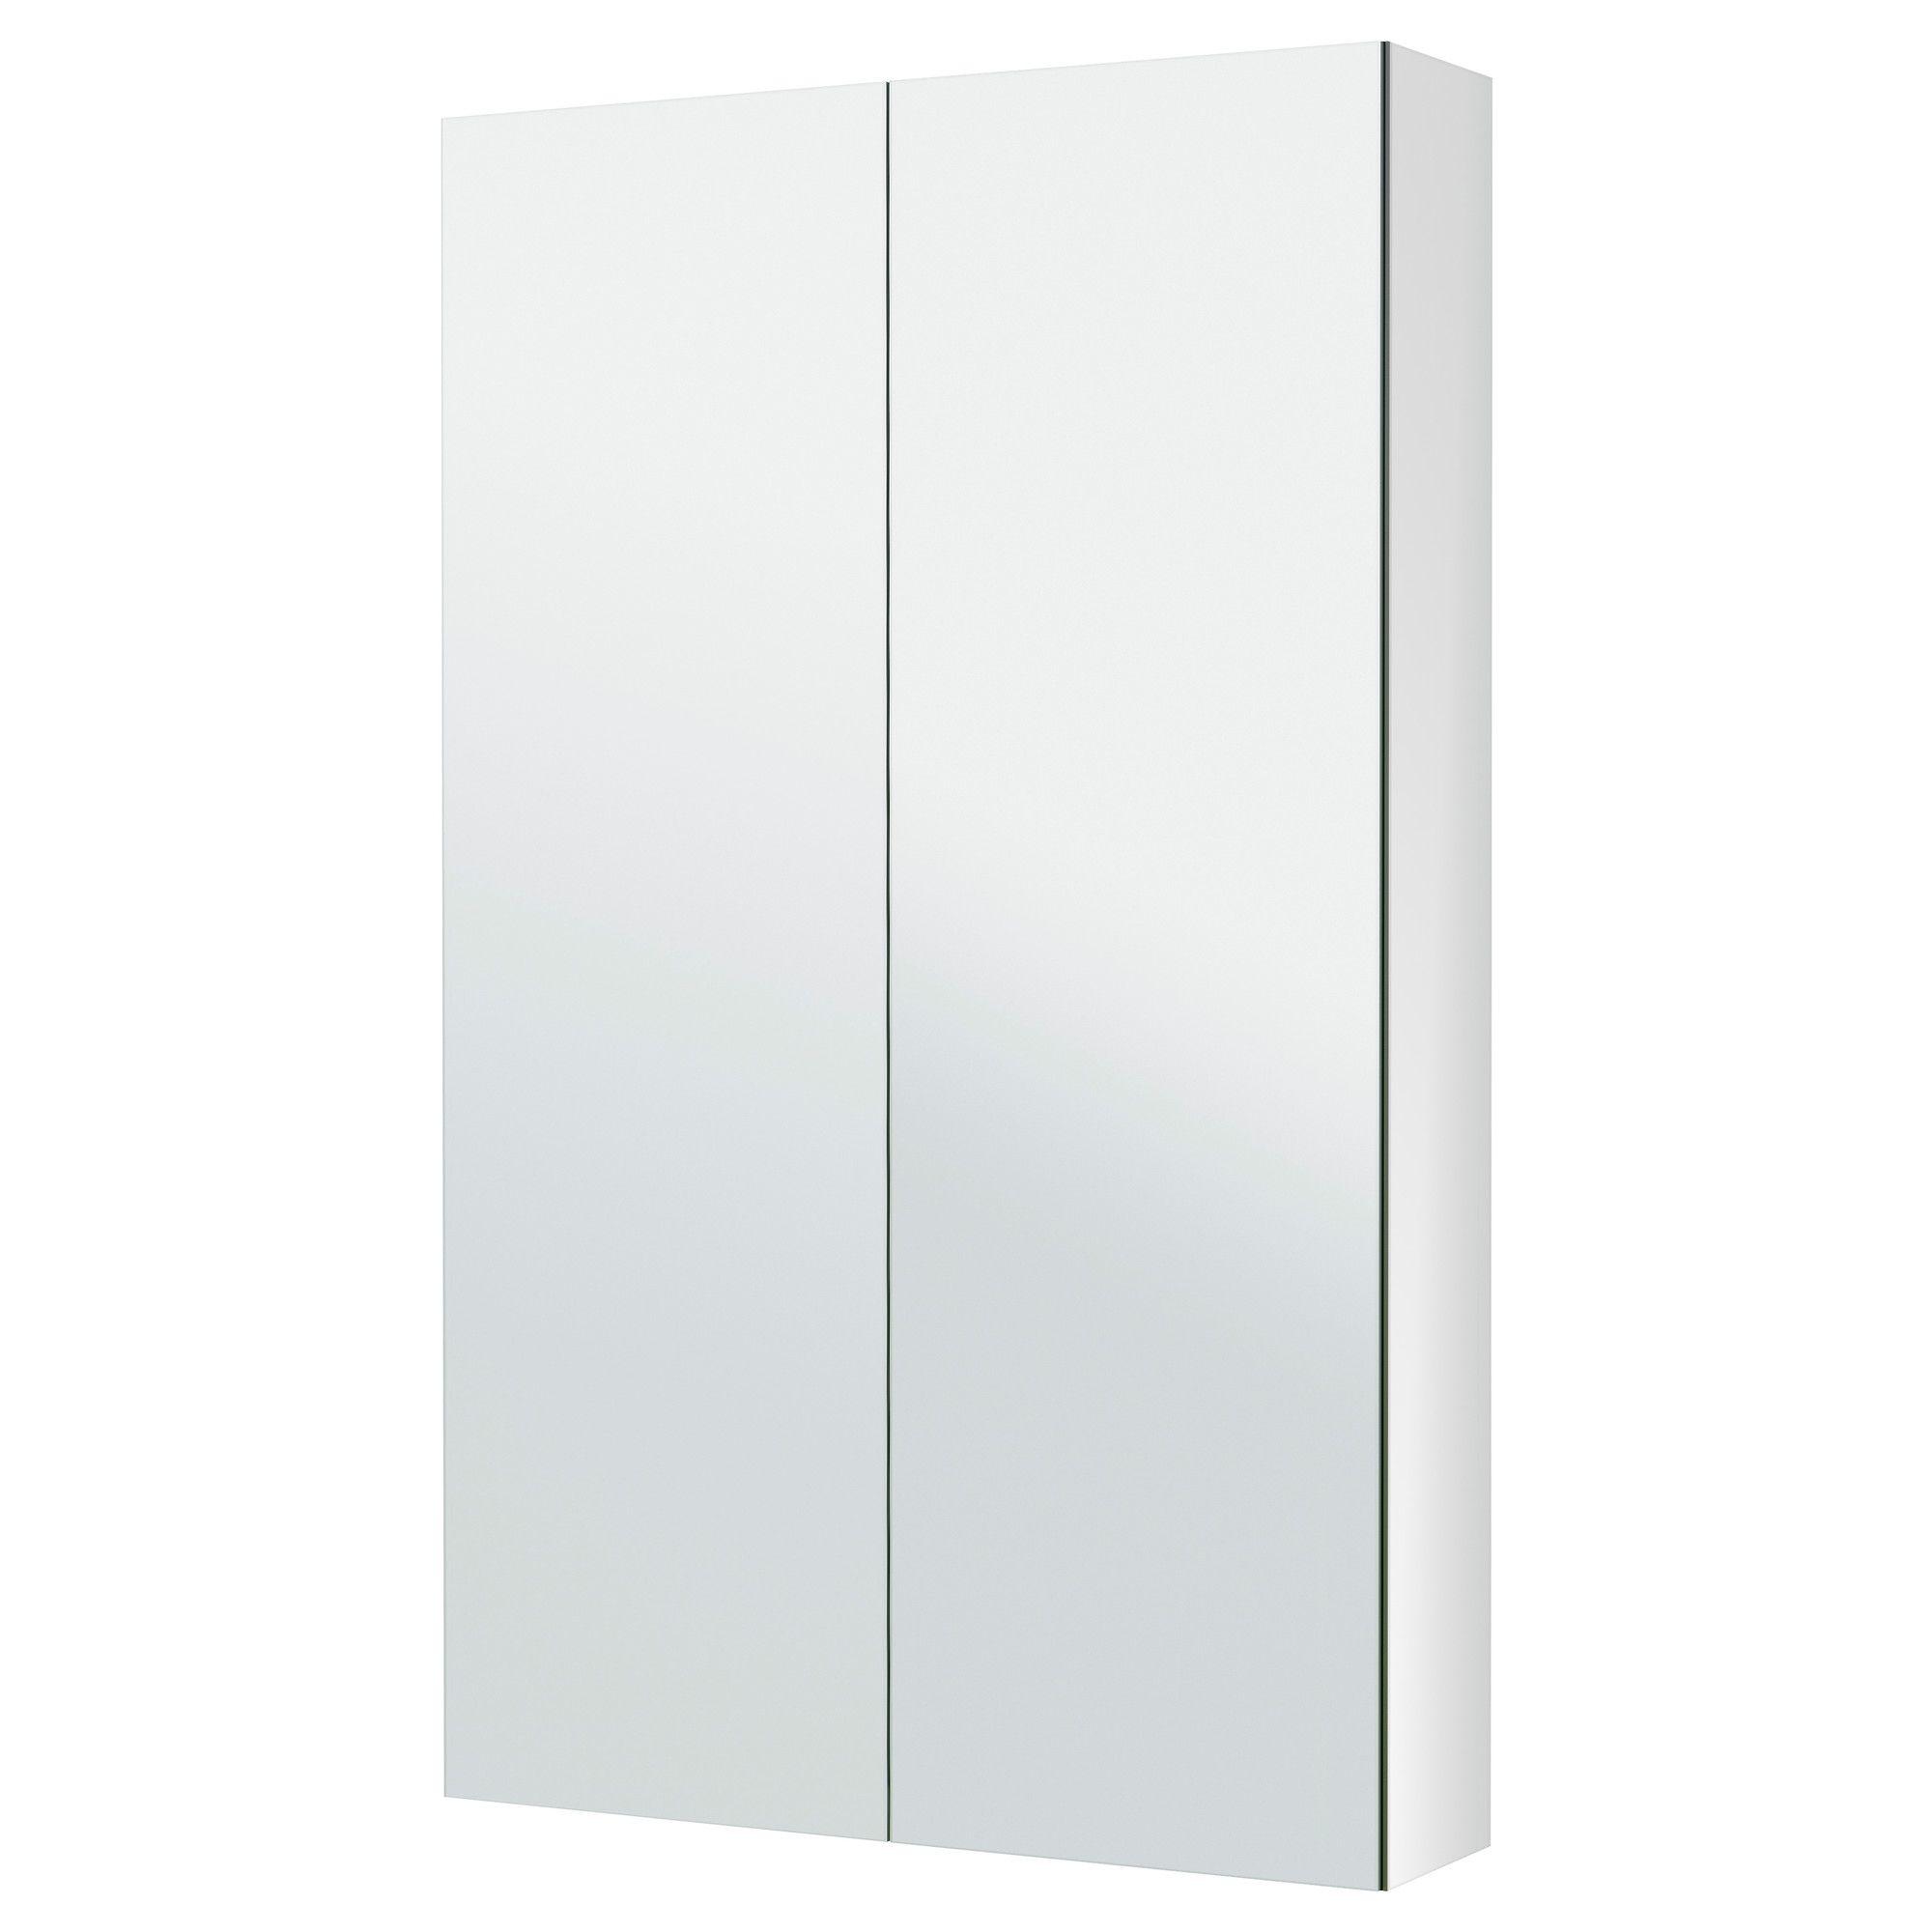 Slimline Bathroom Cabinets With Mirrors | Bathroom Ideas | Pinterest ...